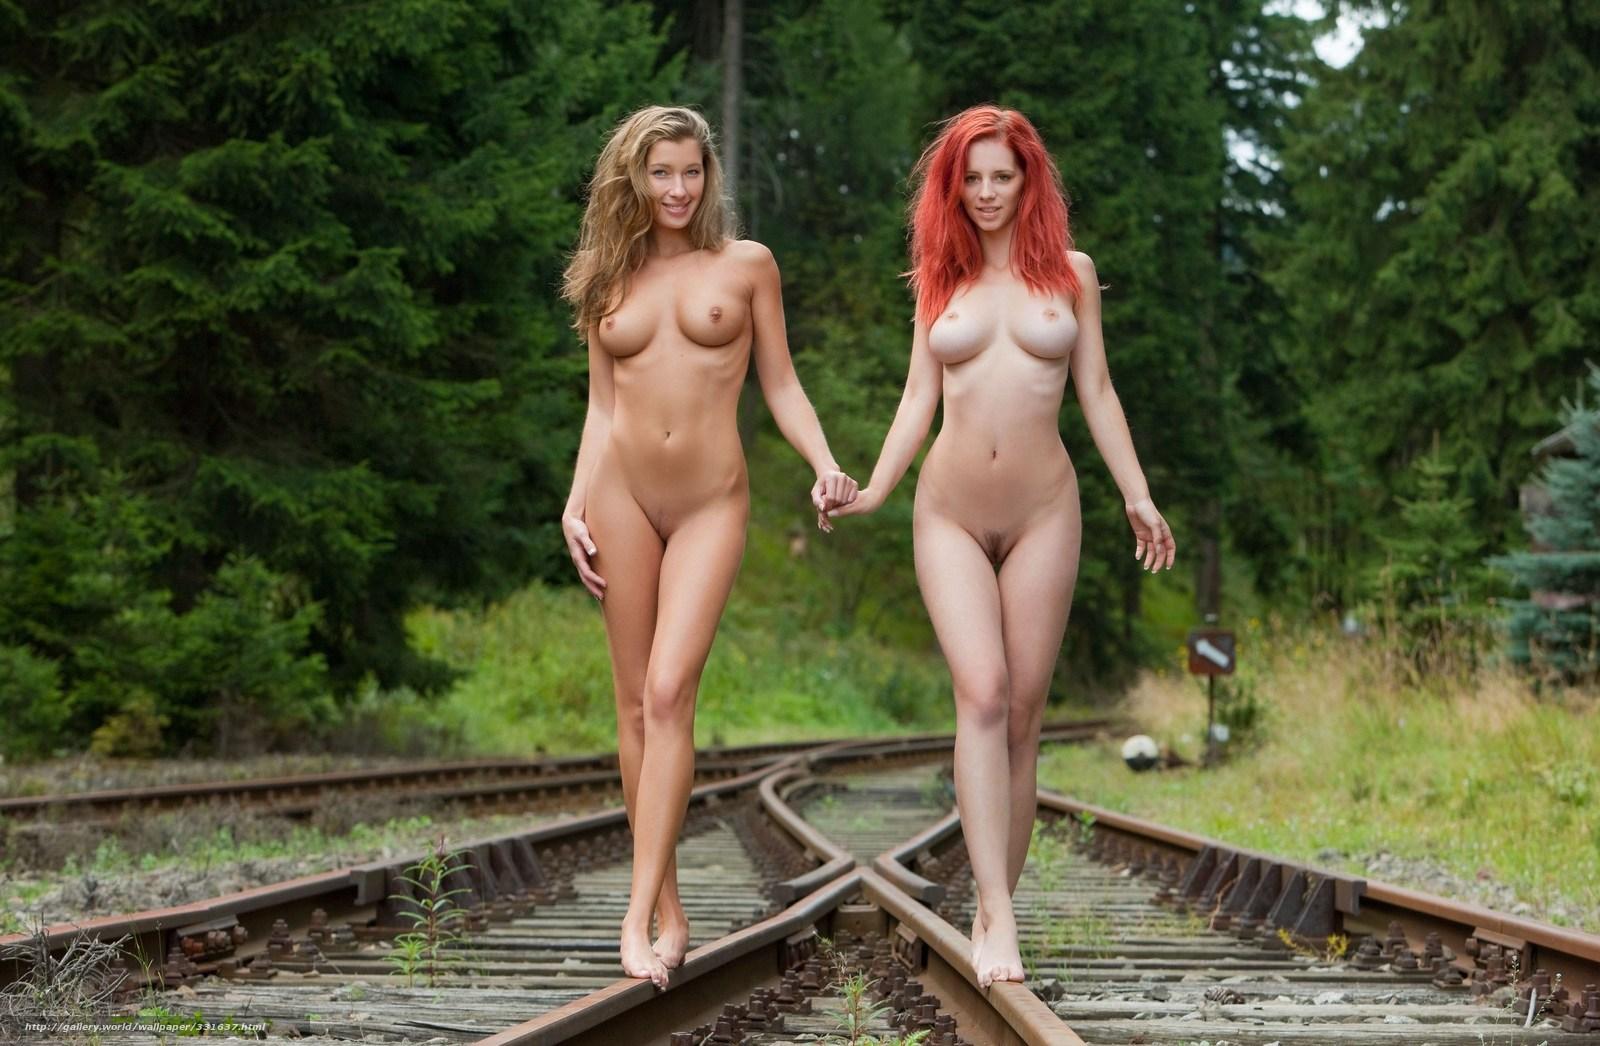 Фото девушки на платформах эротика 19 фотография